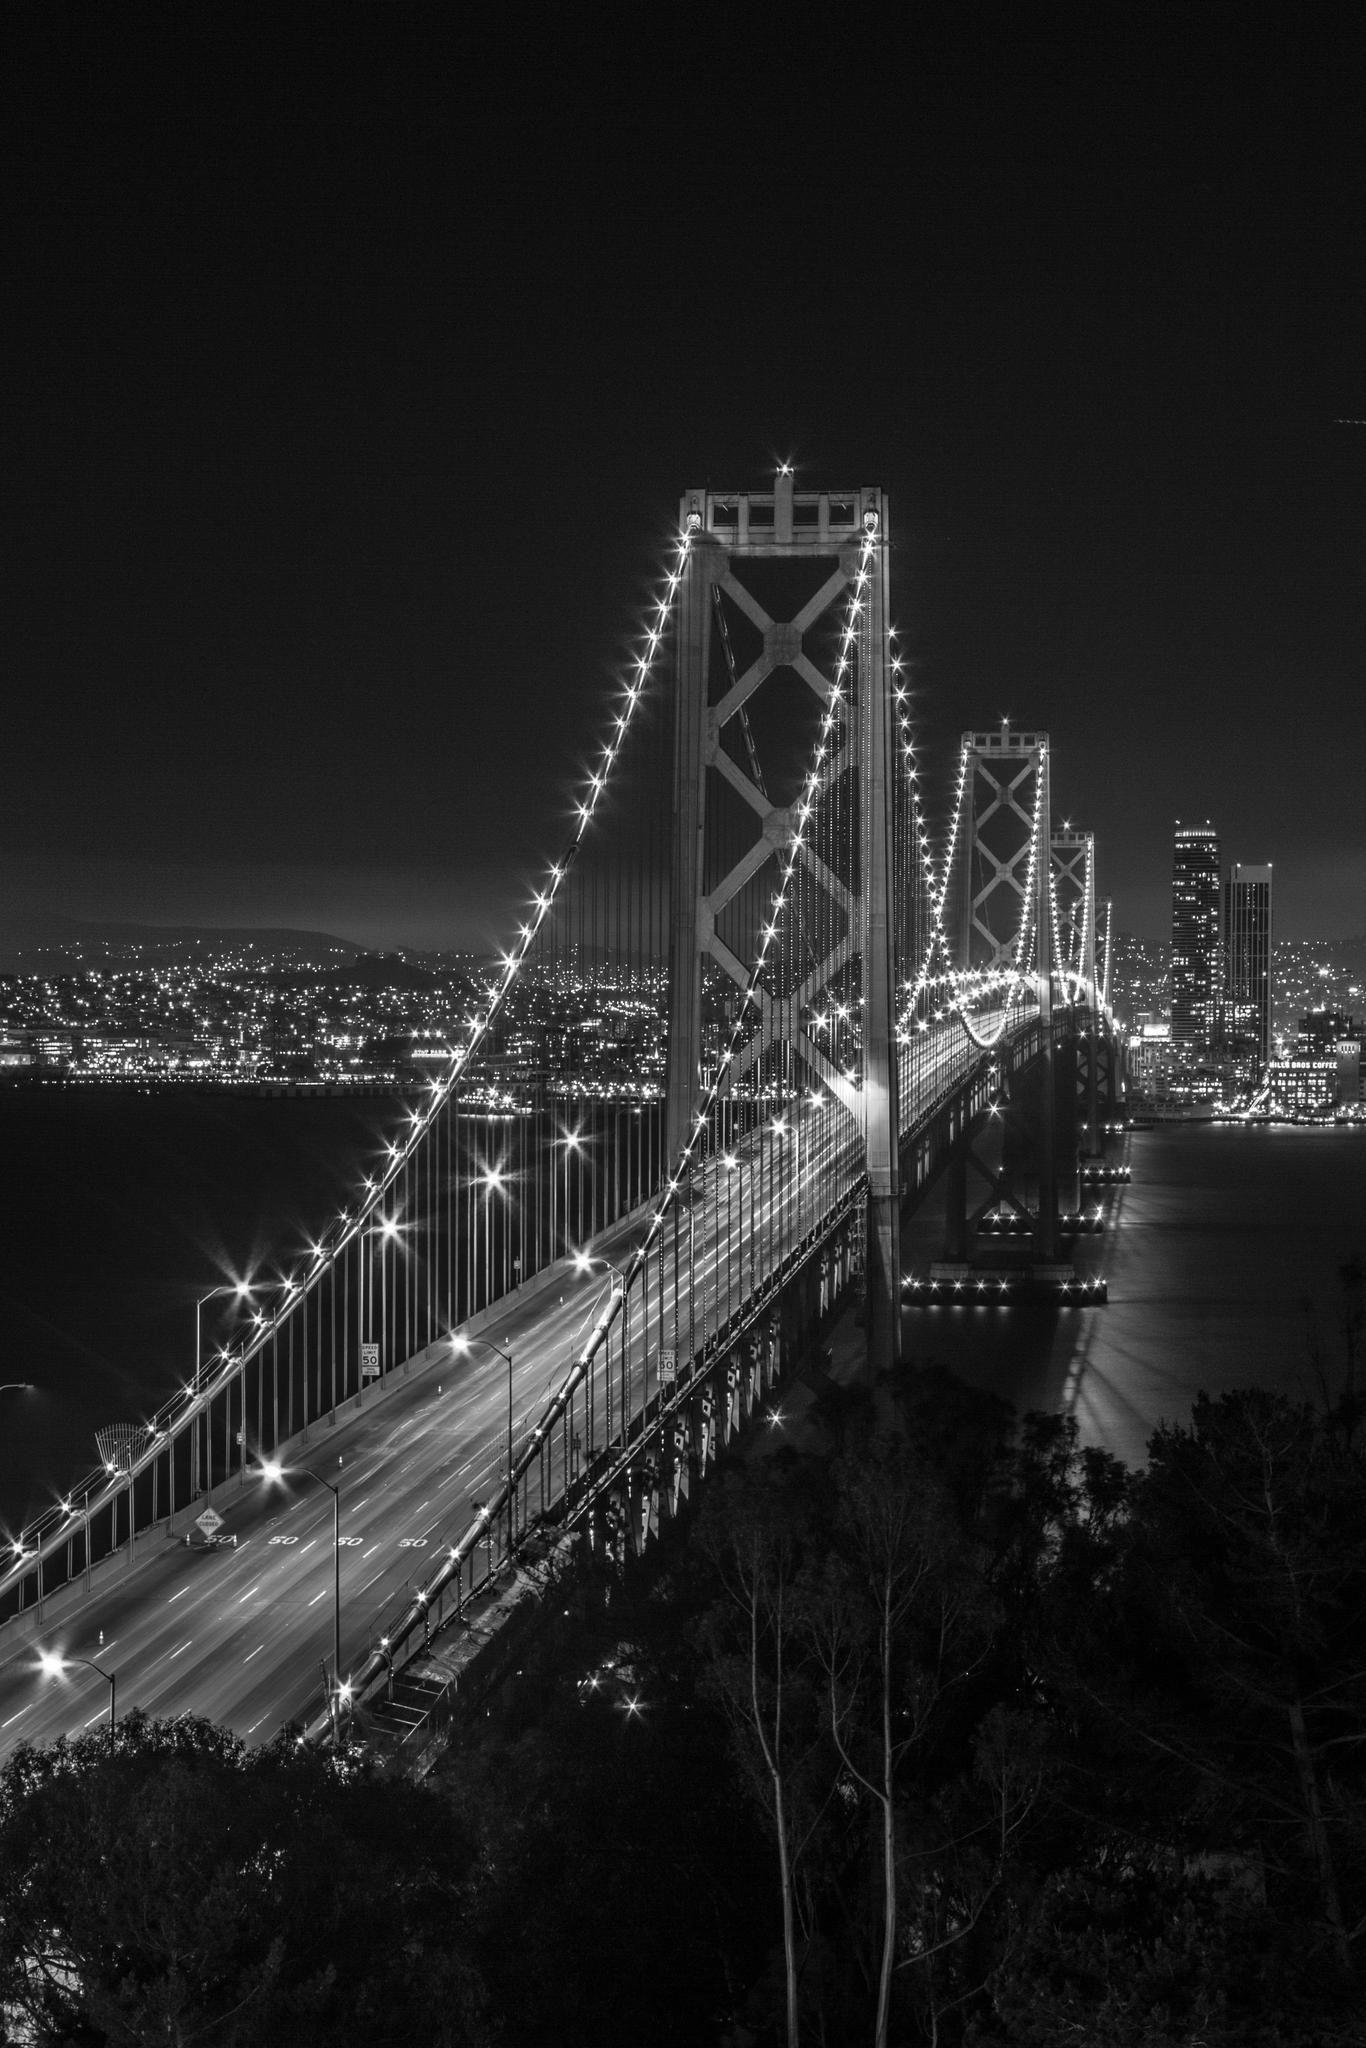 Bay Bridge At Night Black Aesthetic Wallpaper Black And White Picture Wall Black And White Aesthetic